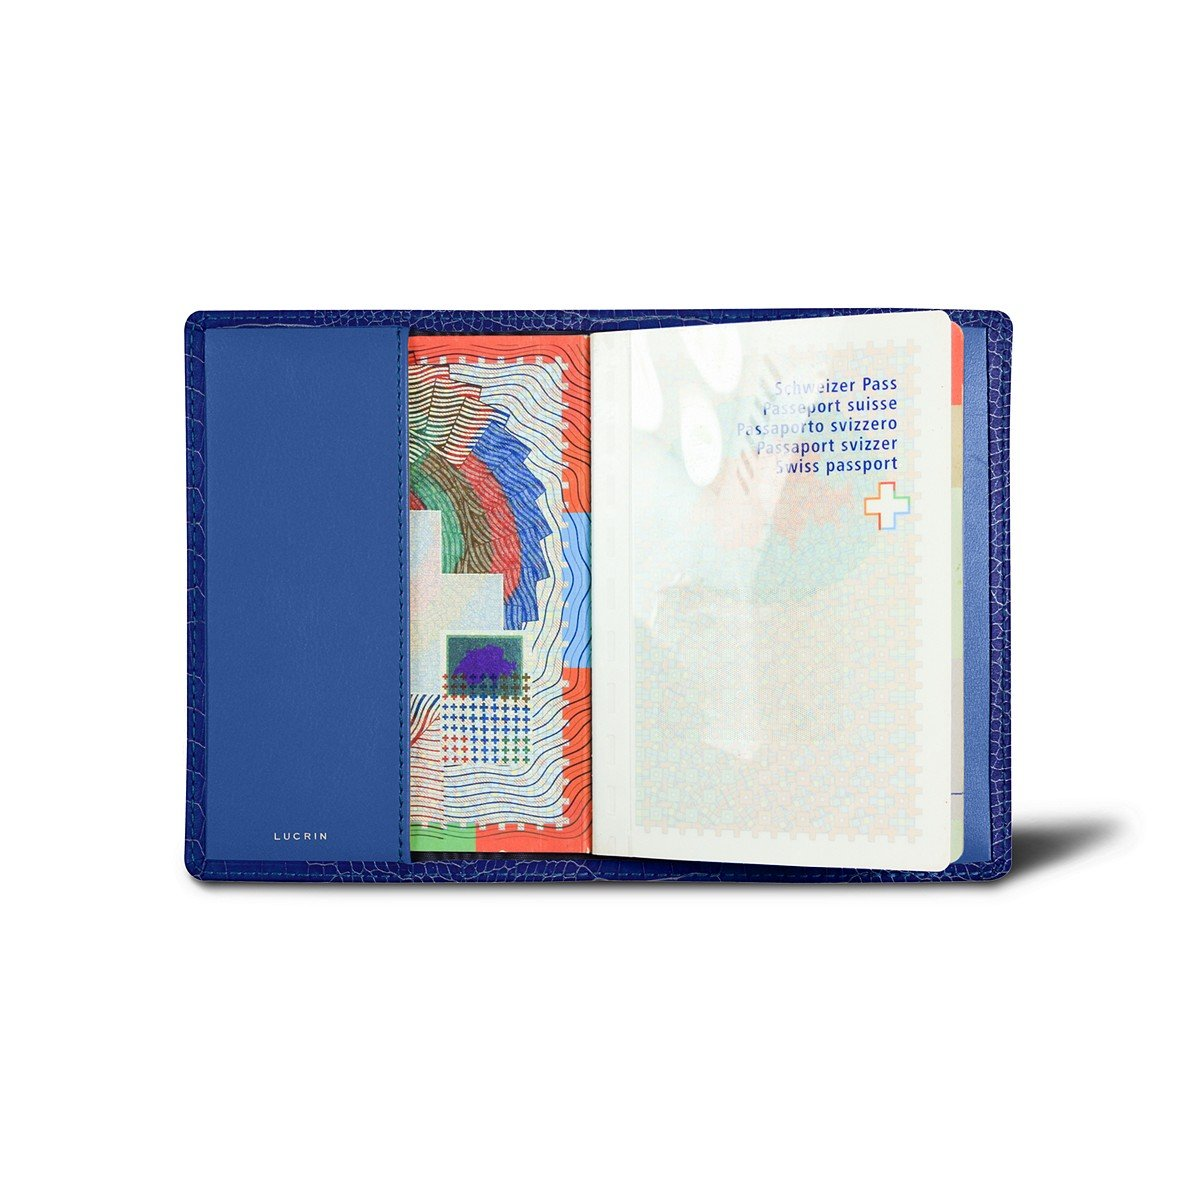 Lucrin - Genuine Leather USA Passport Cover - Royal Blue - Crocodile style calfskin